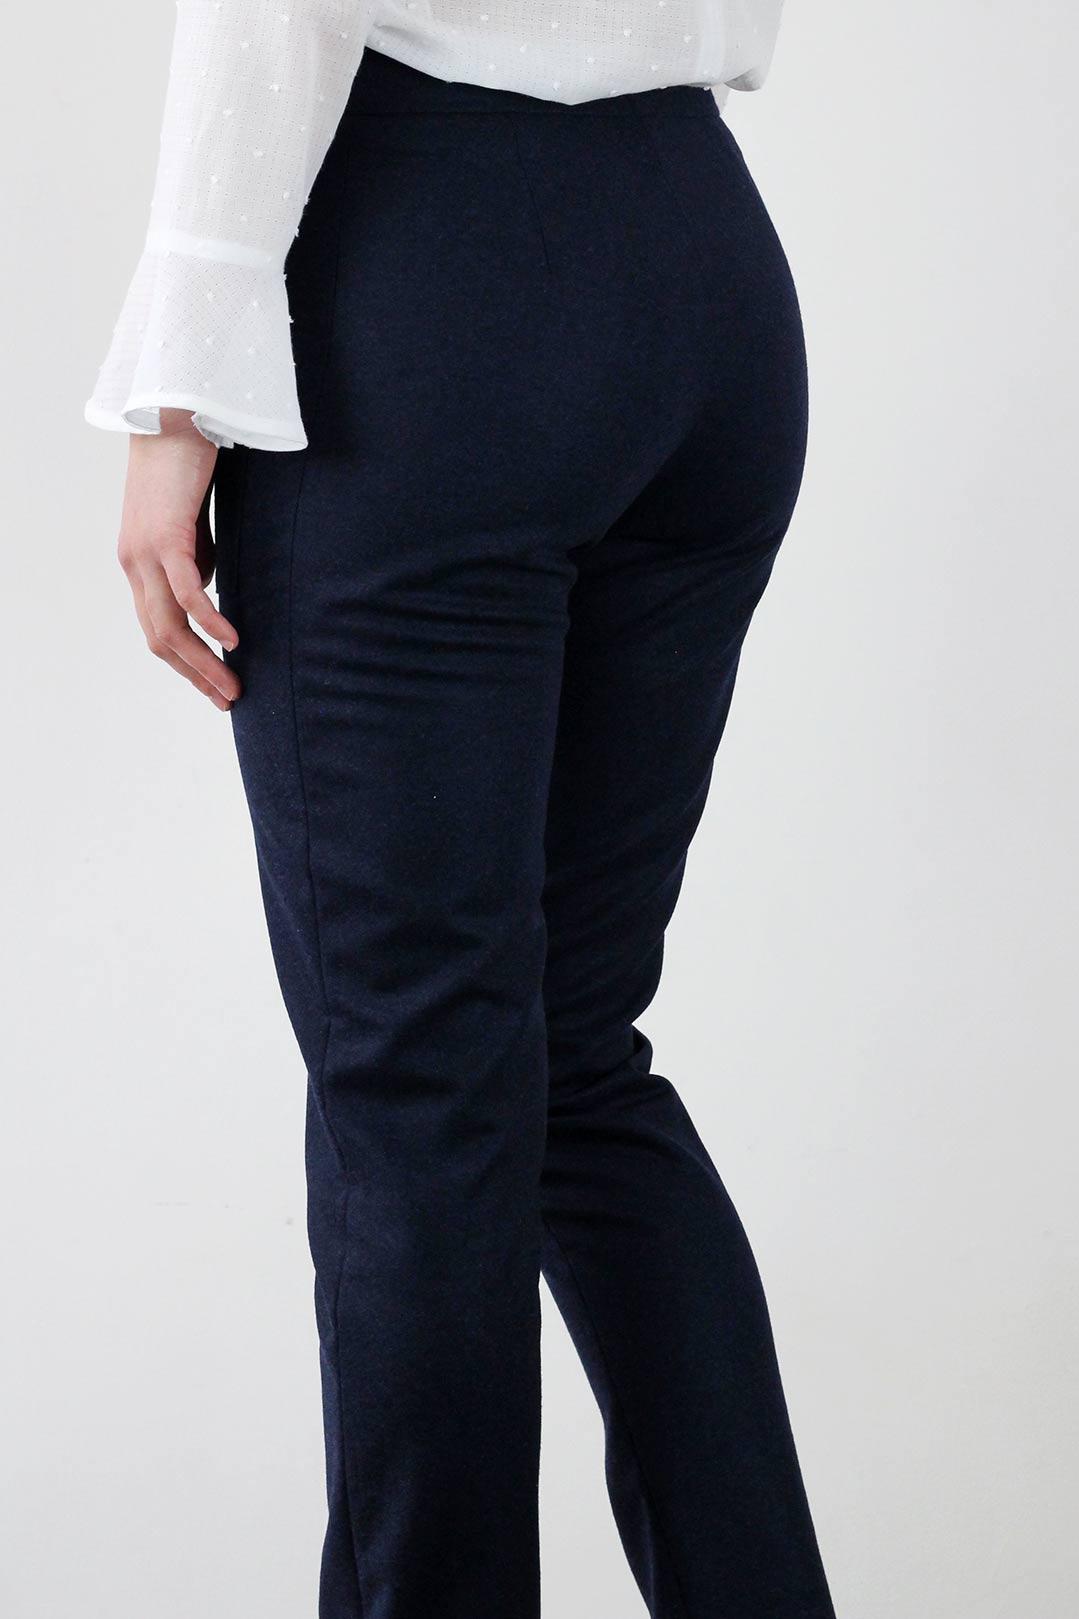 pantalon-flanelle-femme-4